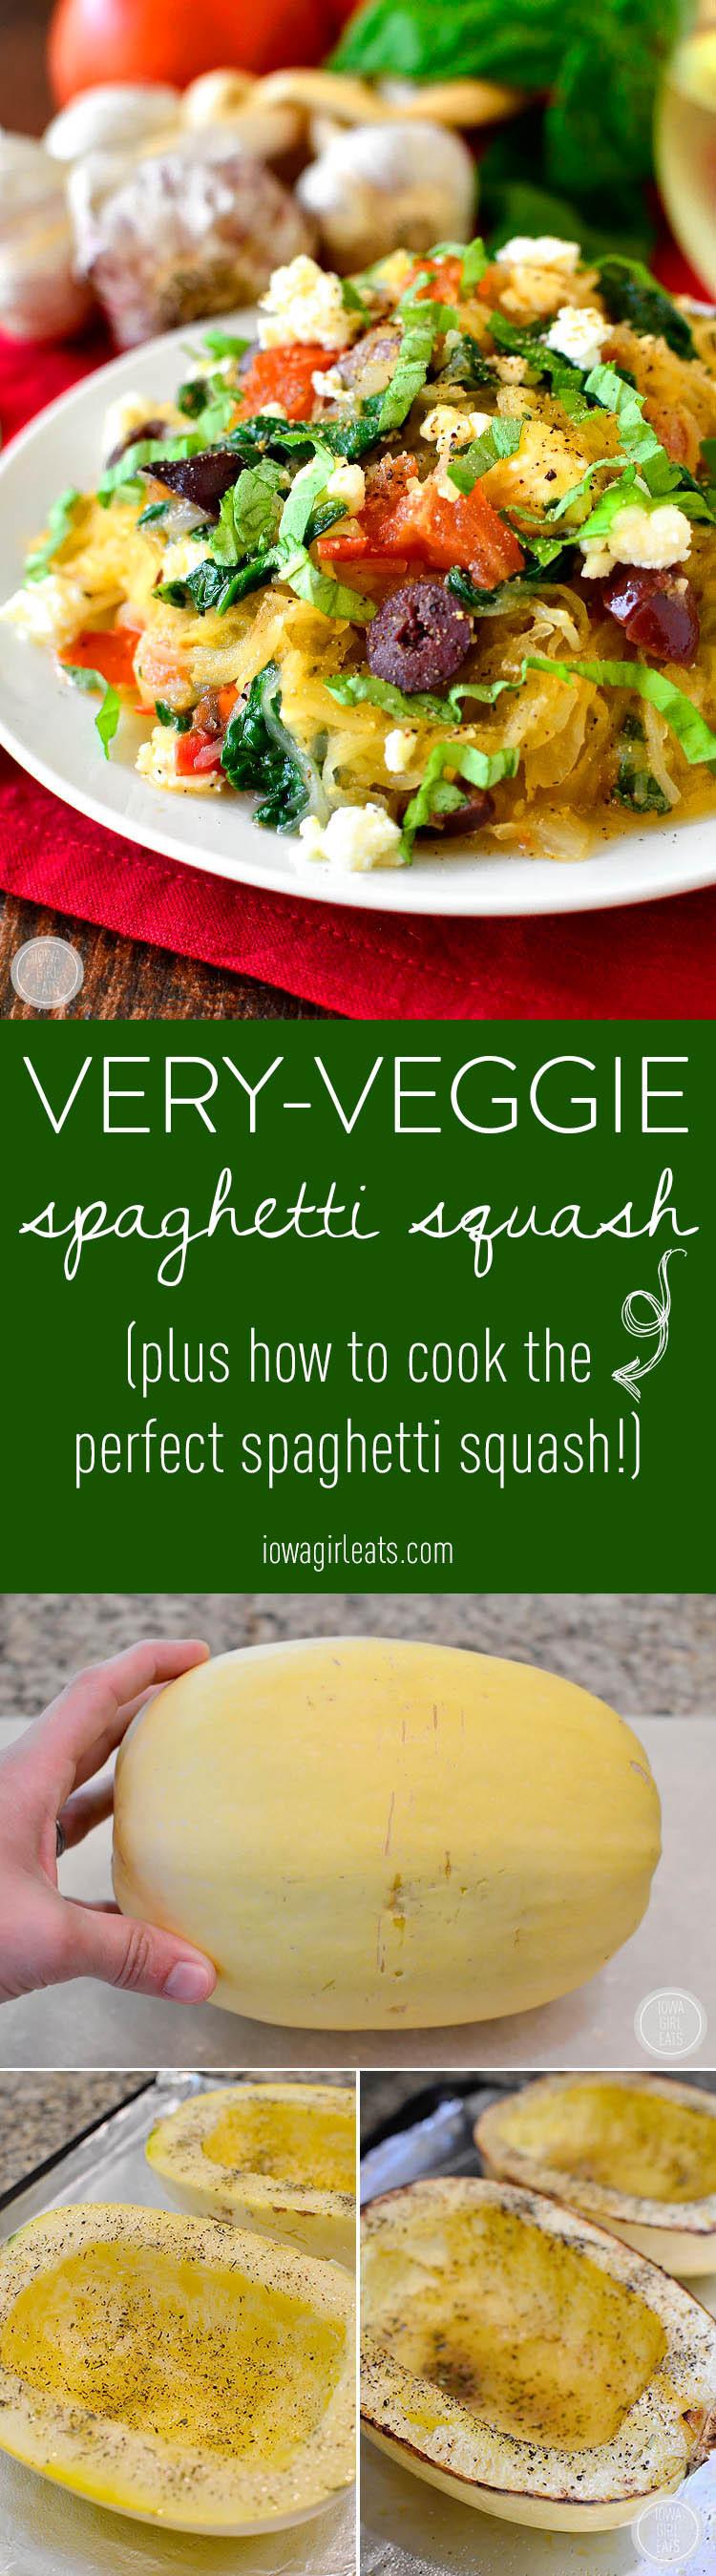 Very Healthy Dinners  Very Veggie Spaghetti Squash Iowa Girl Eats